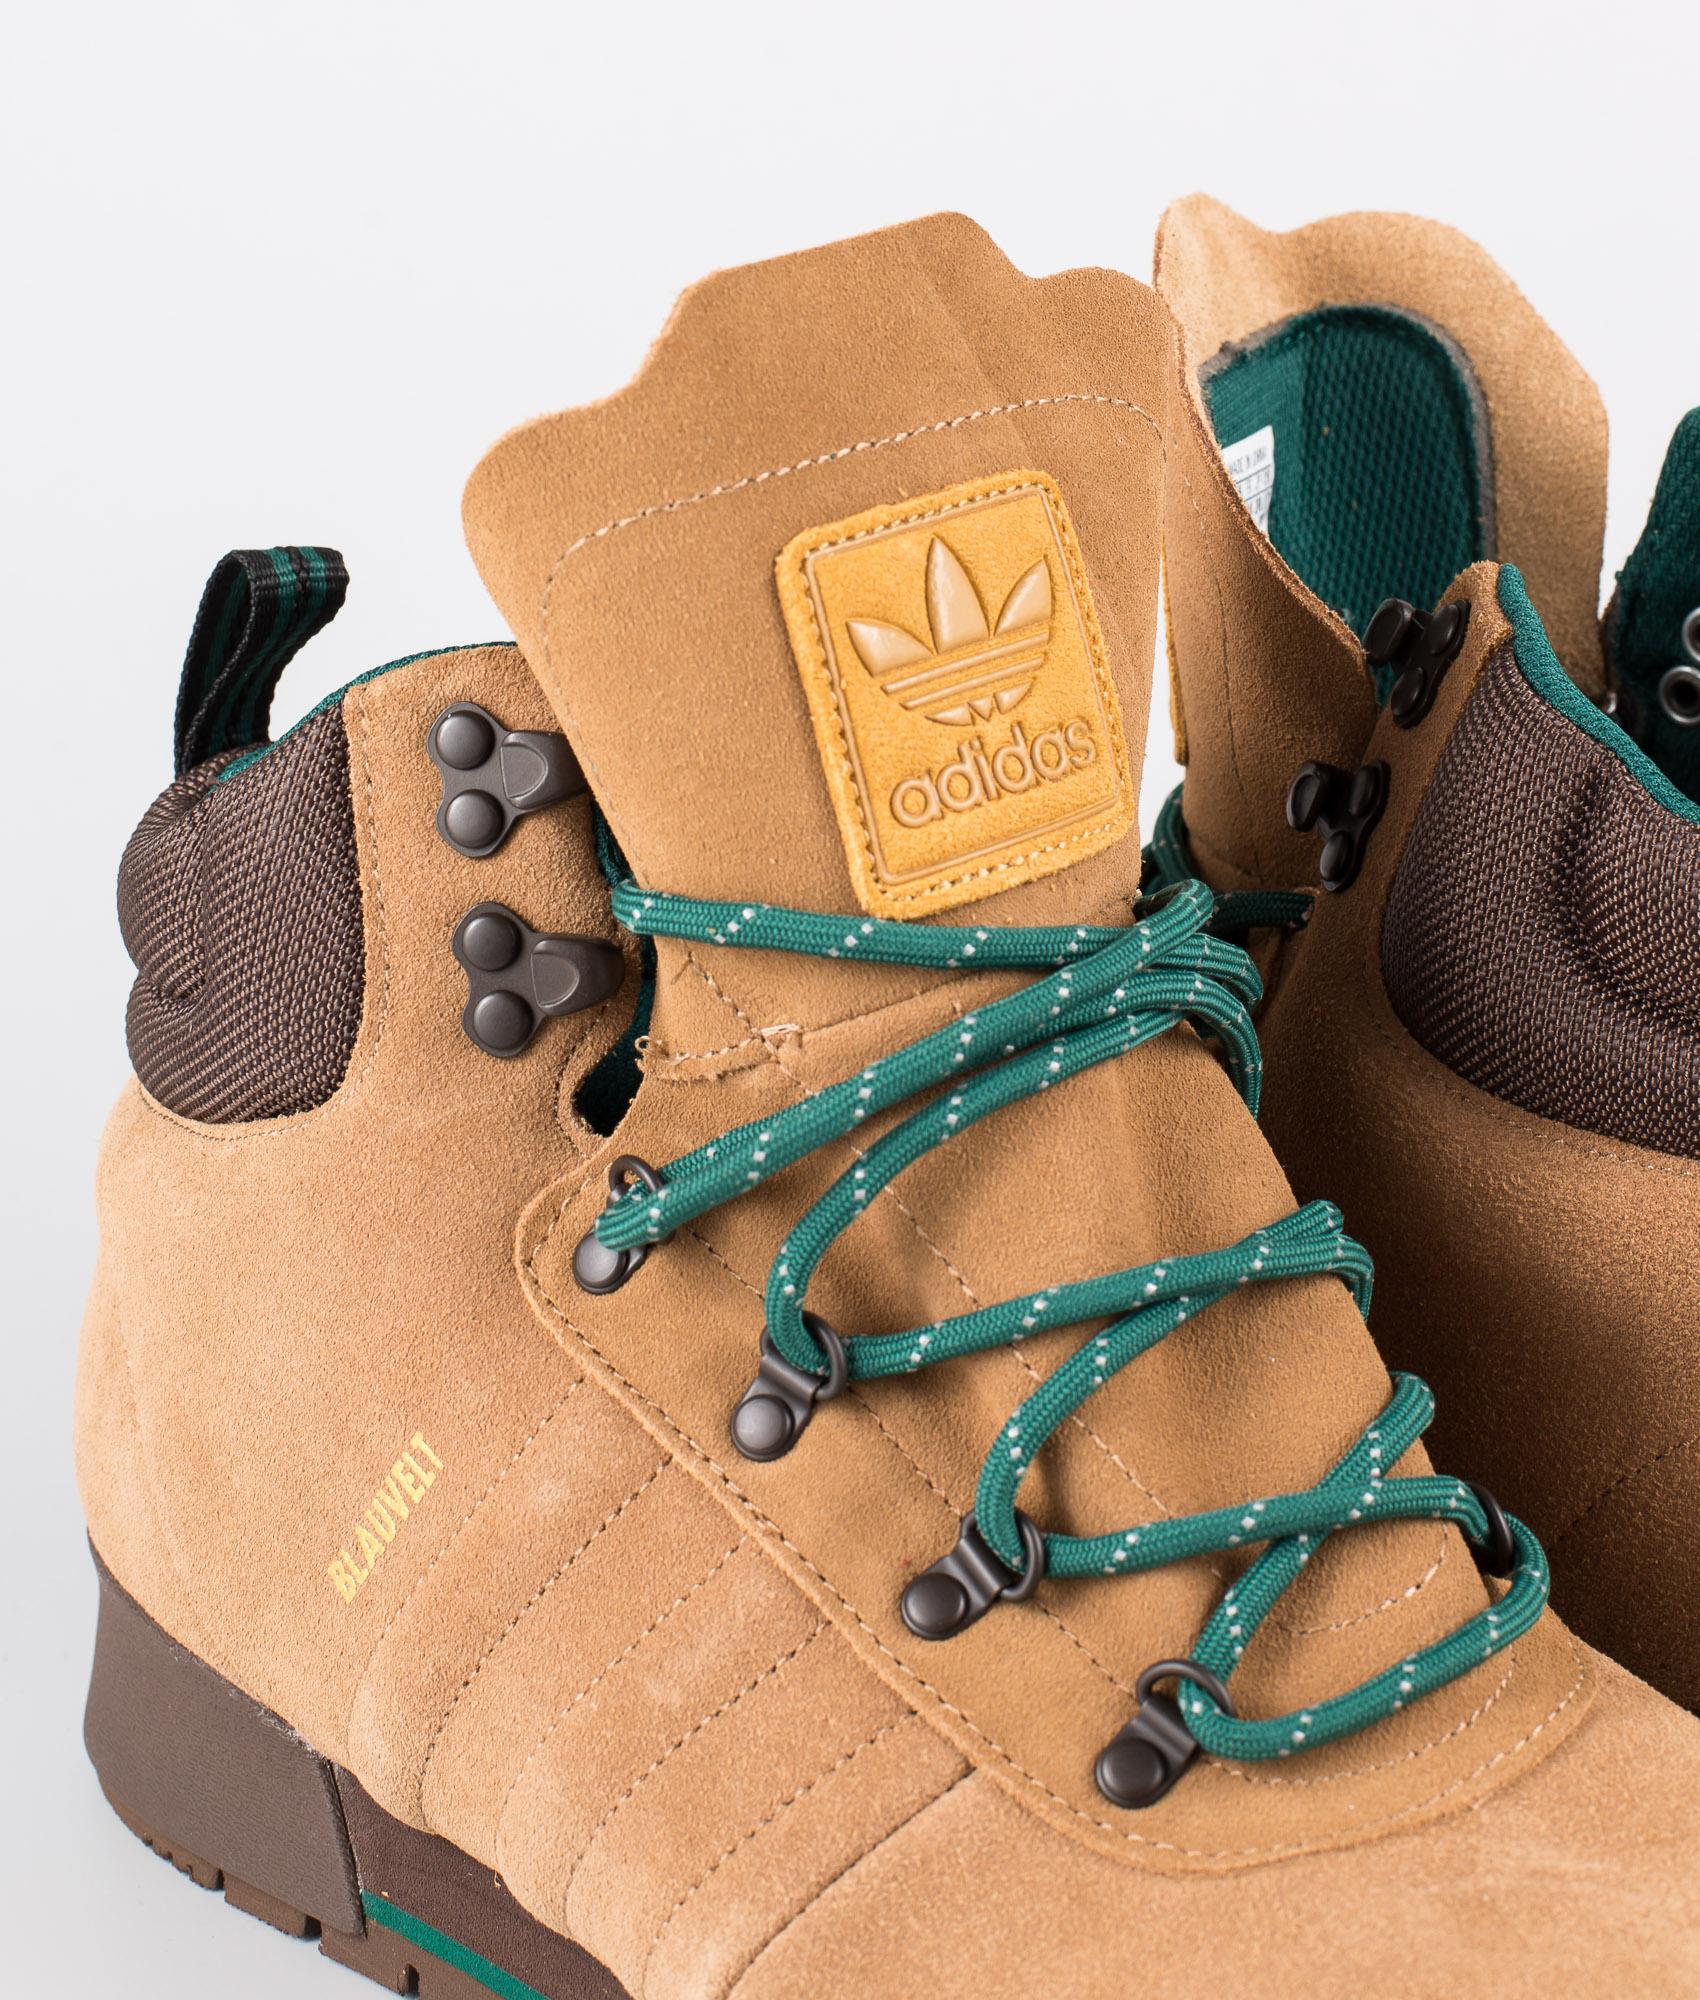 Adidas Skateboarding Jake Boot 2.0 Shoes Raw DesertBrownCollegiate Green